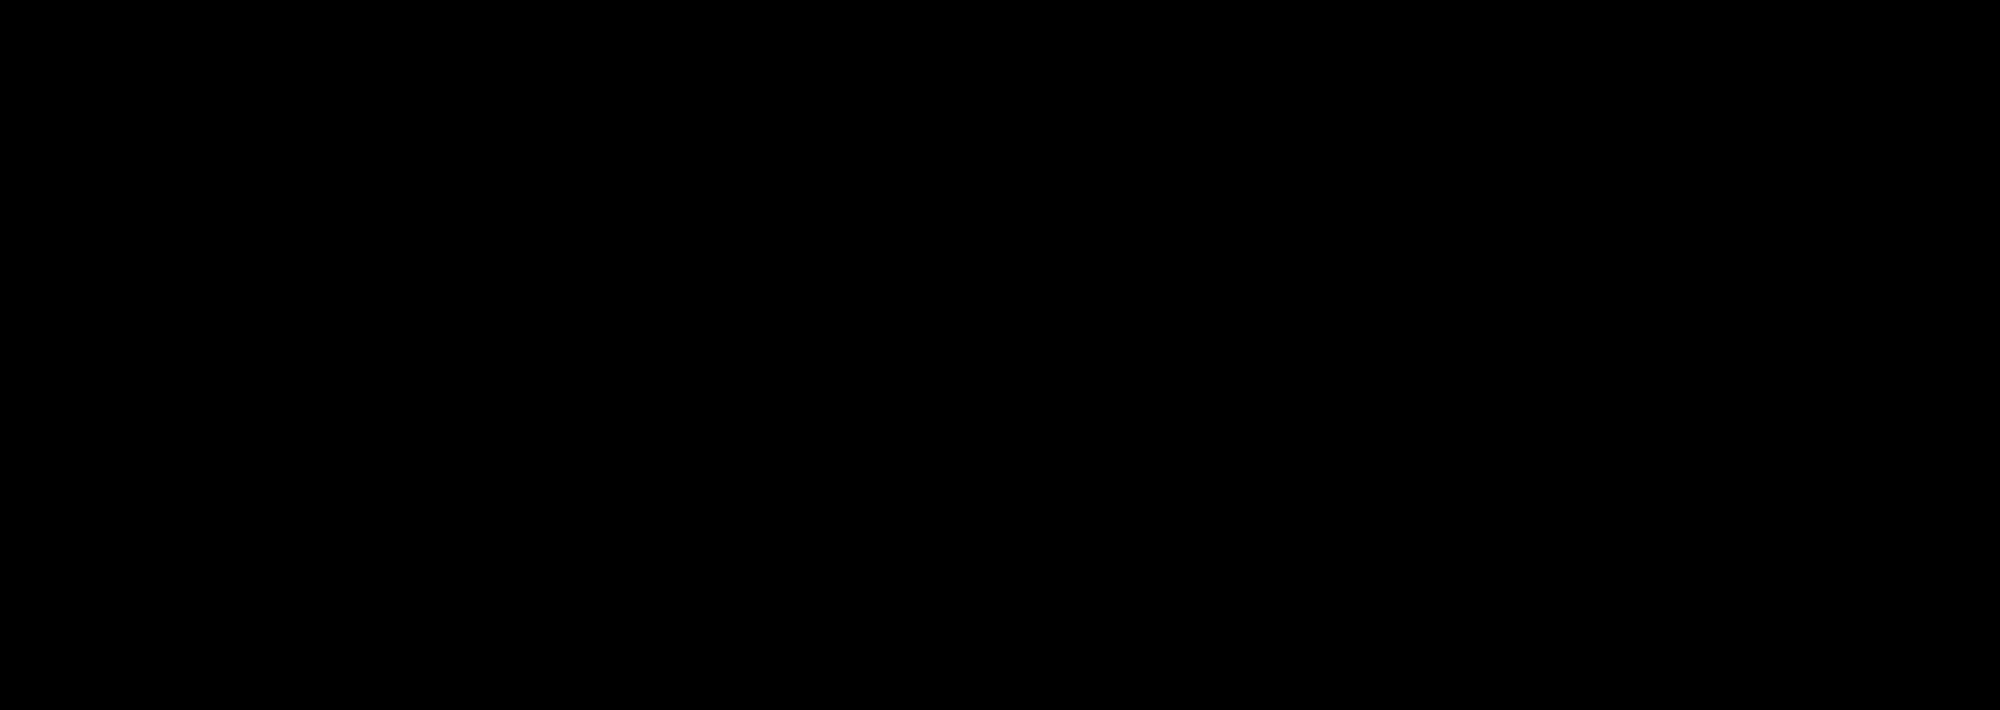 the dance calendar pgh-logo.png